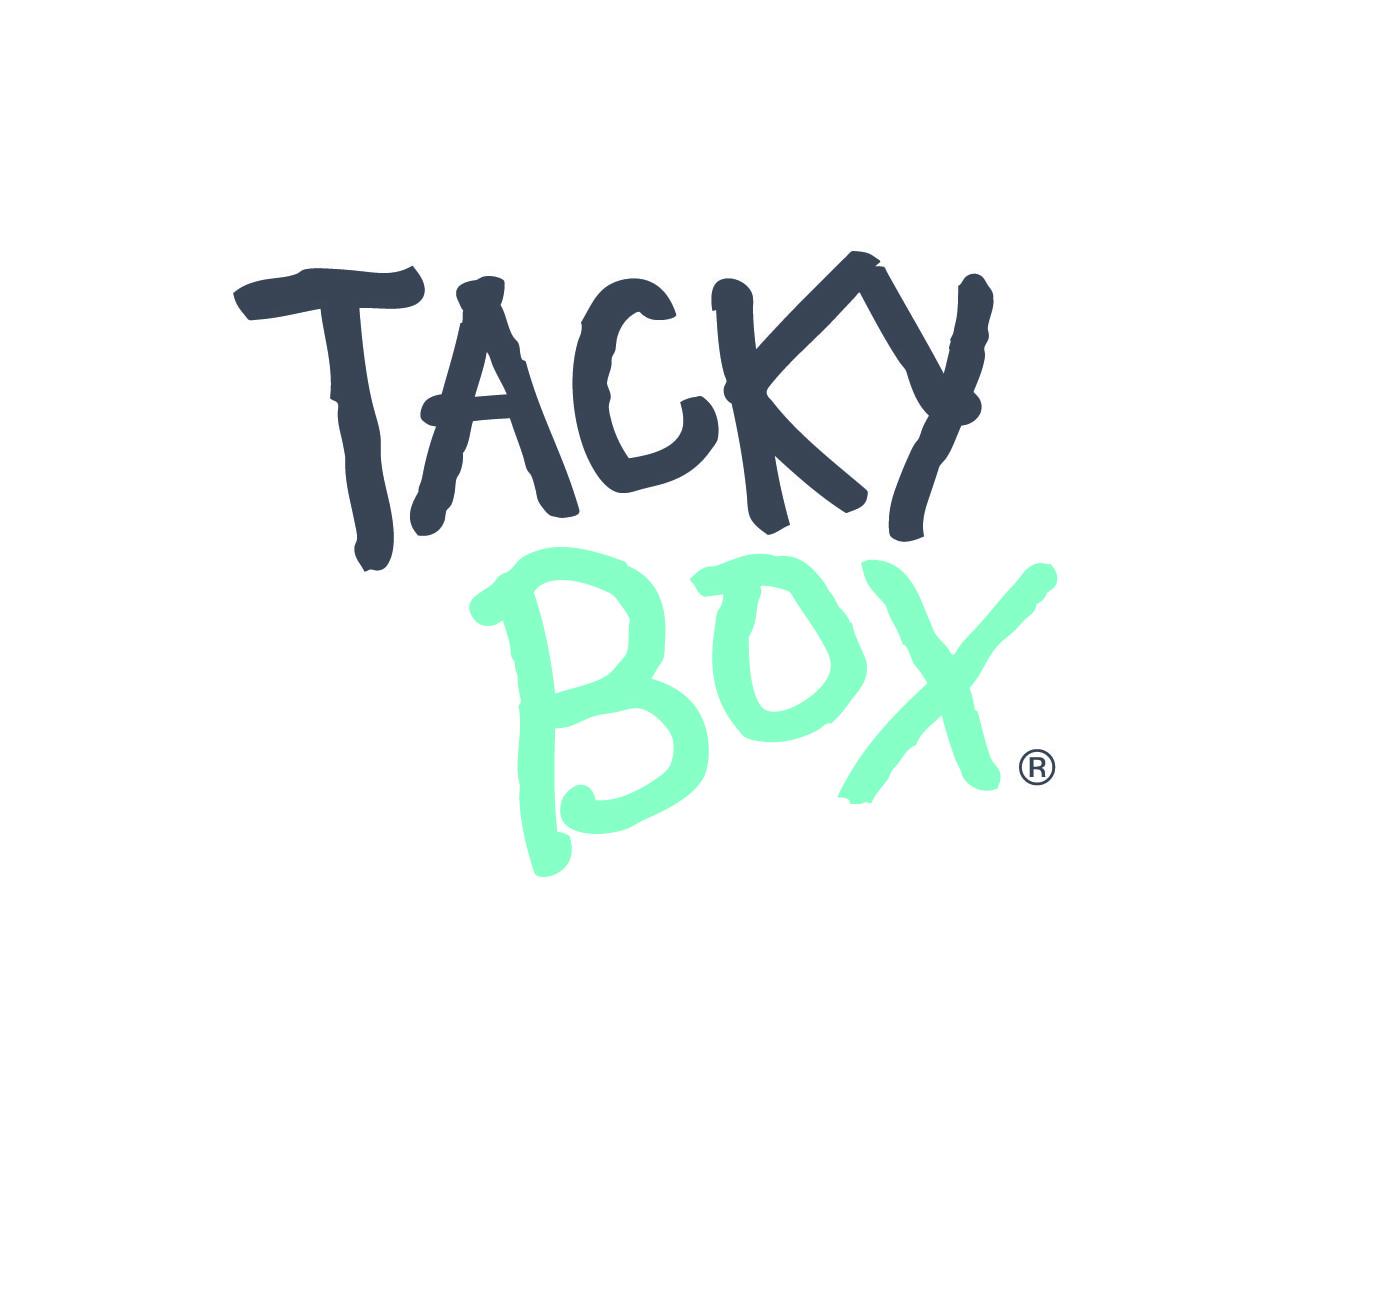 Tacky Box Logo-Type Only-CMYK.jpg